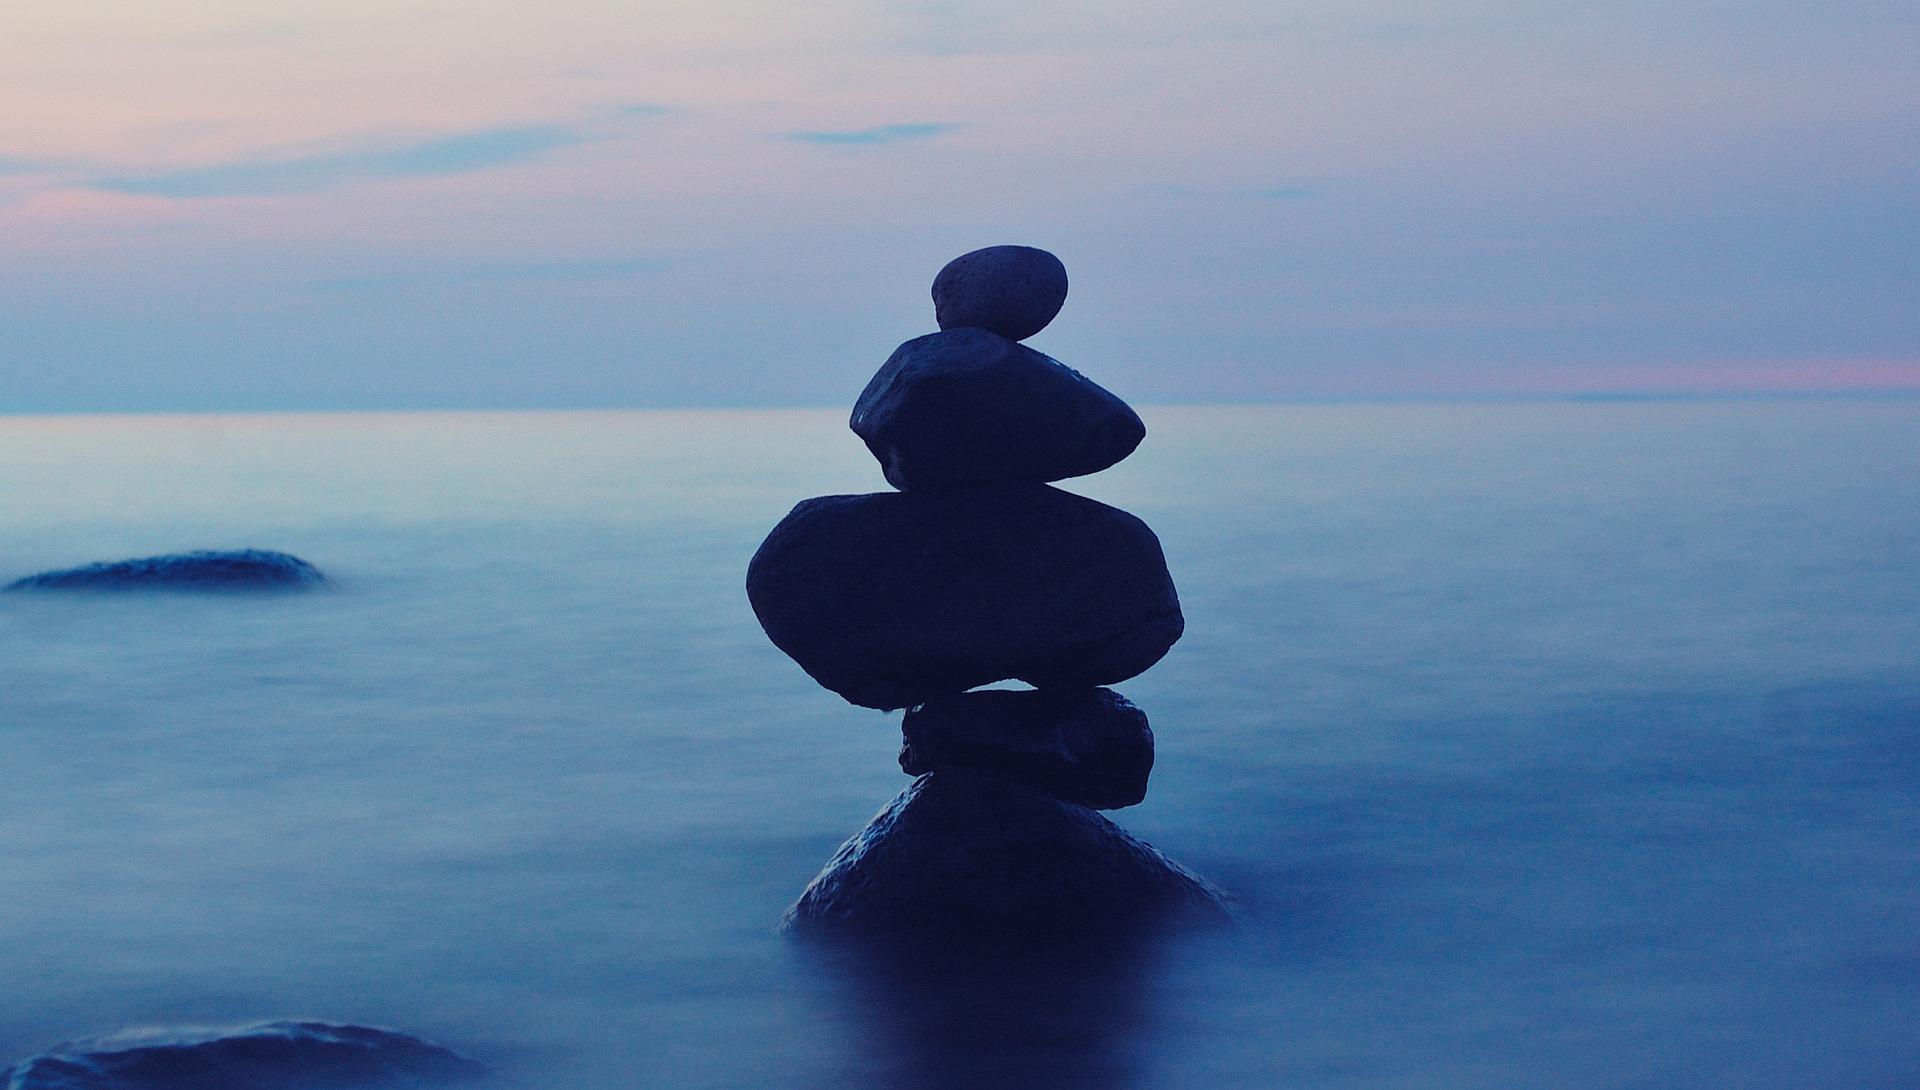 randi_hausmann_balance